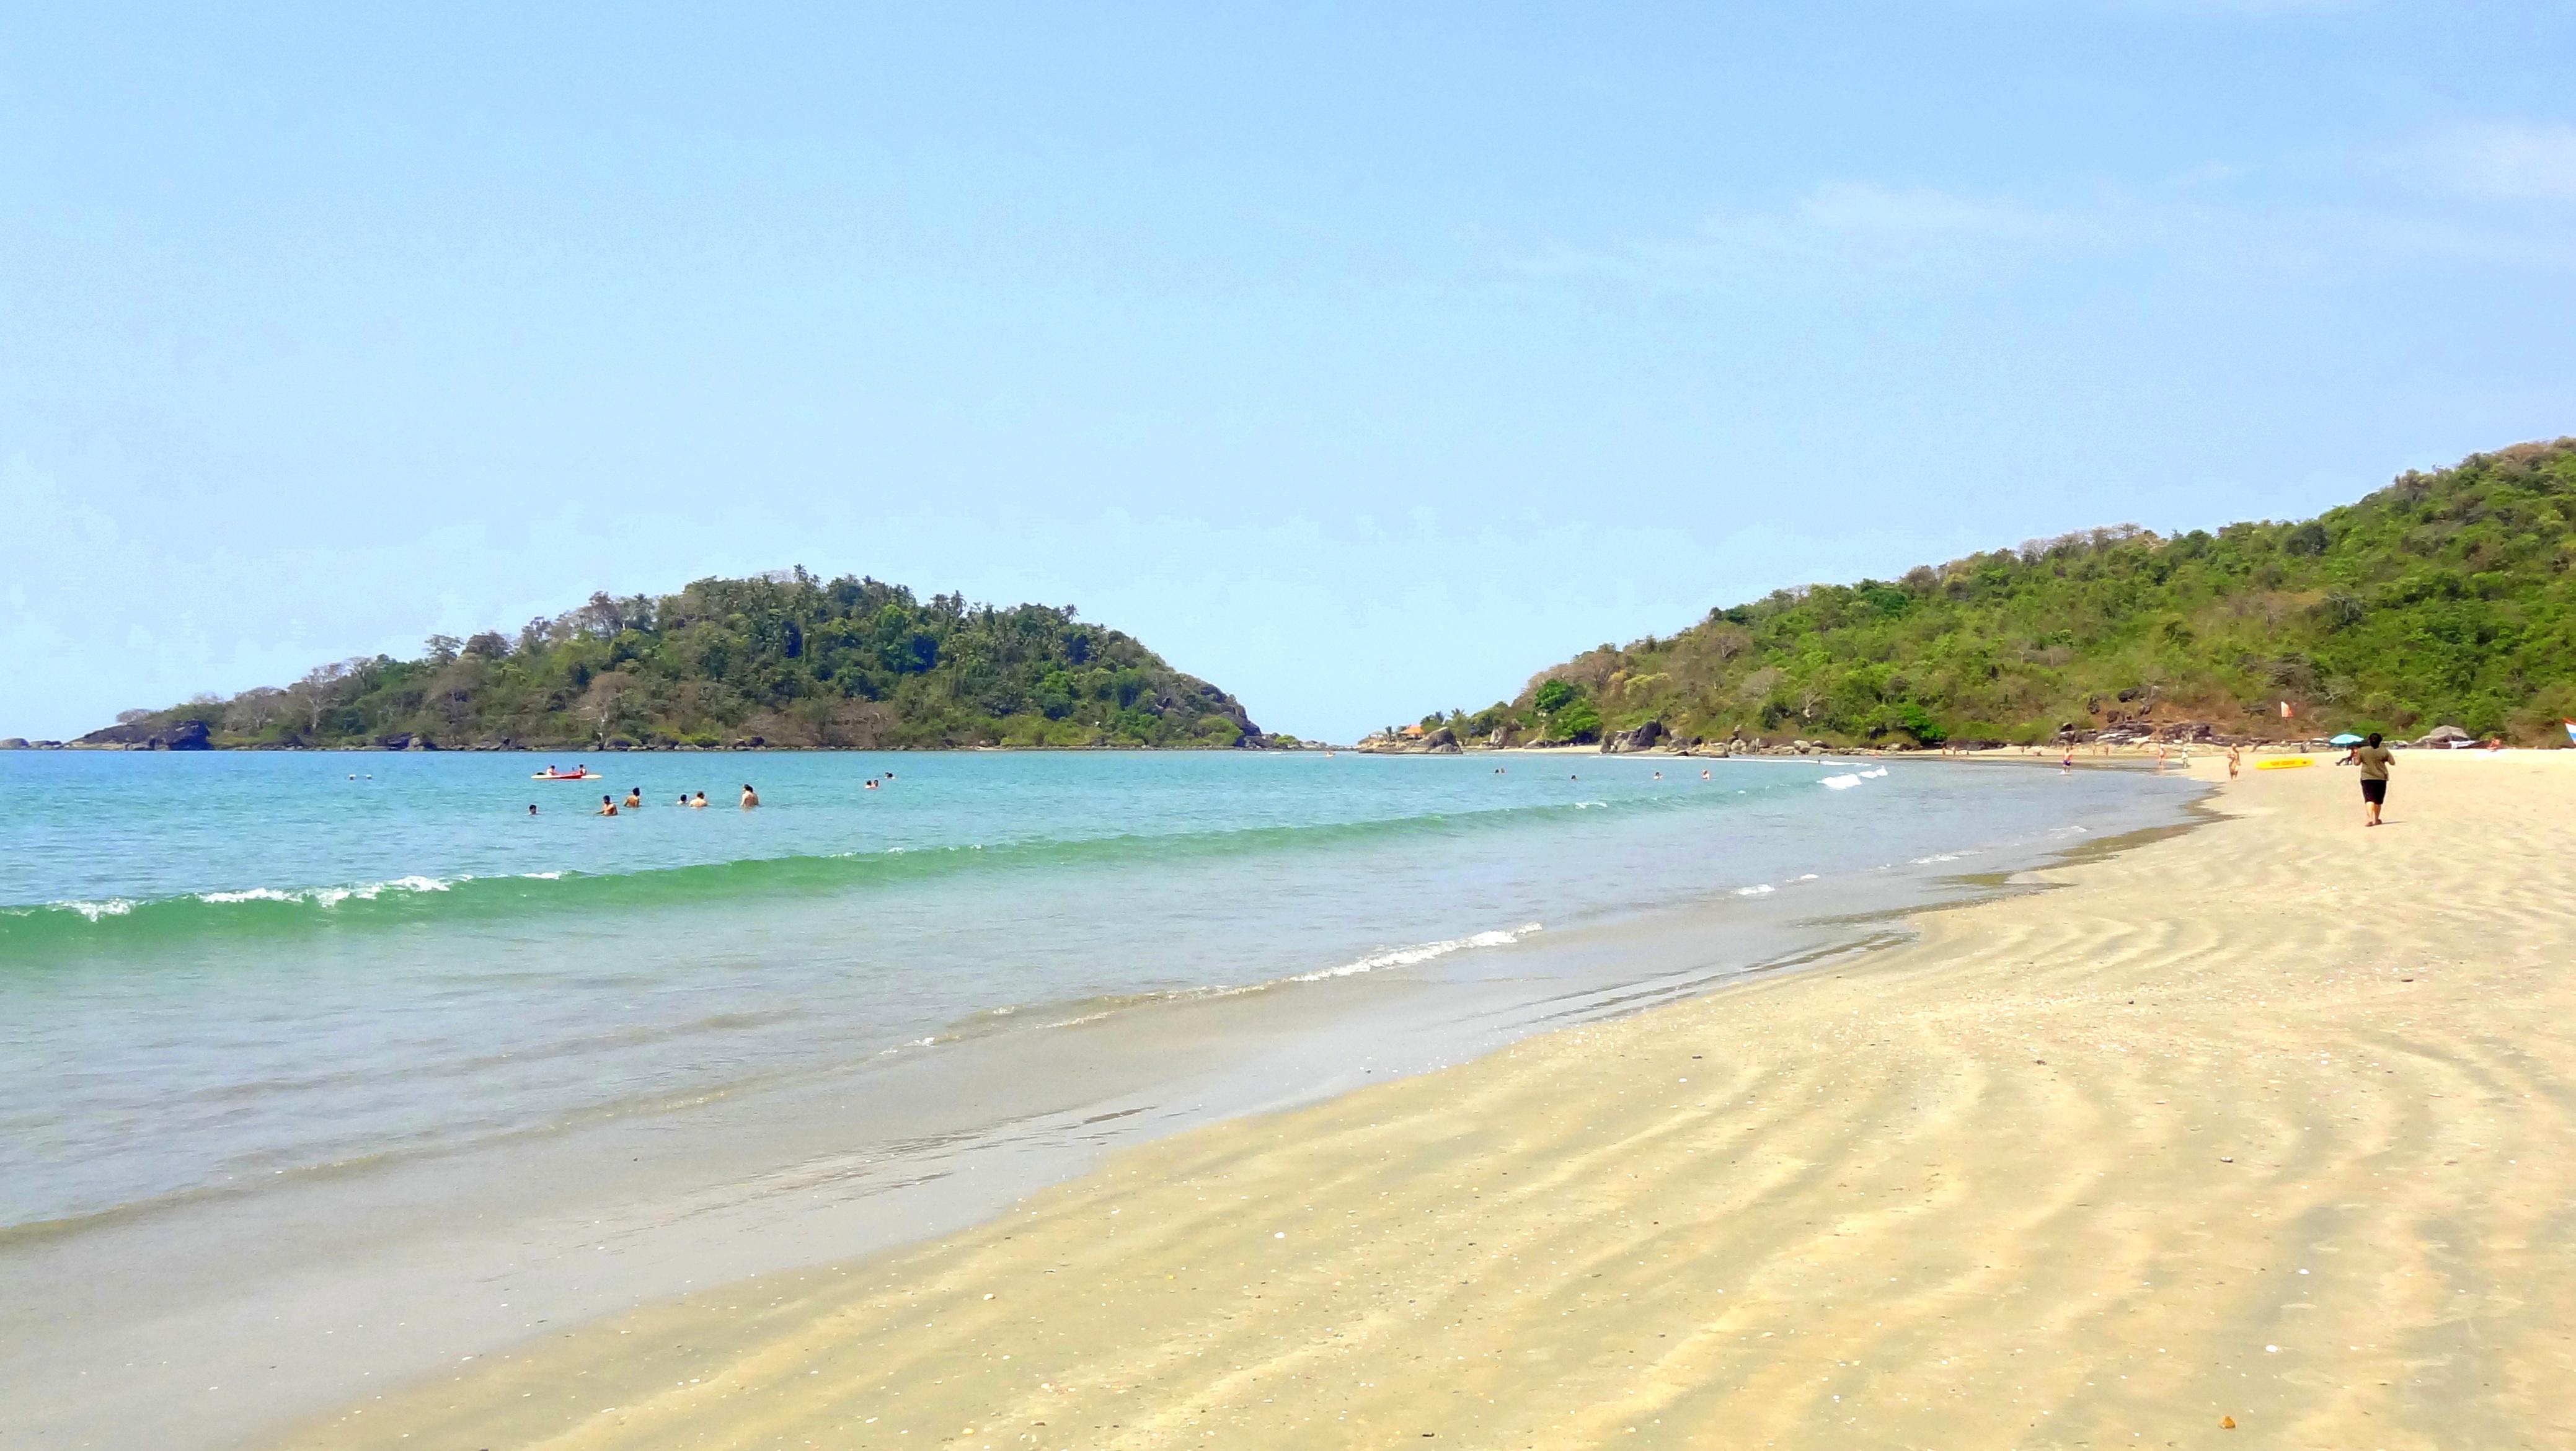 Filegoa Beautiful Beachjpg  Wikimedia Commons